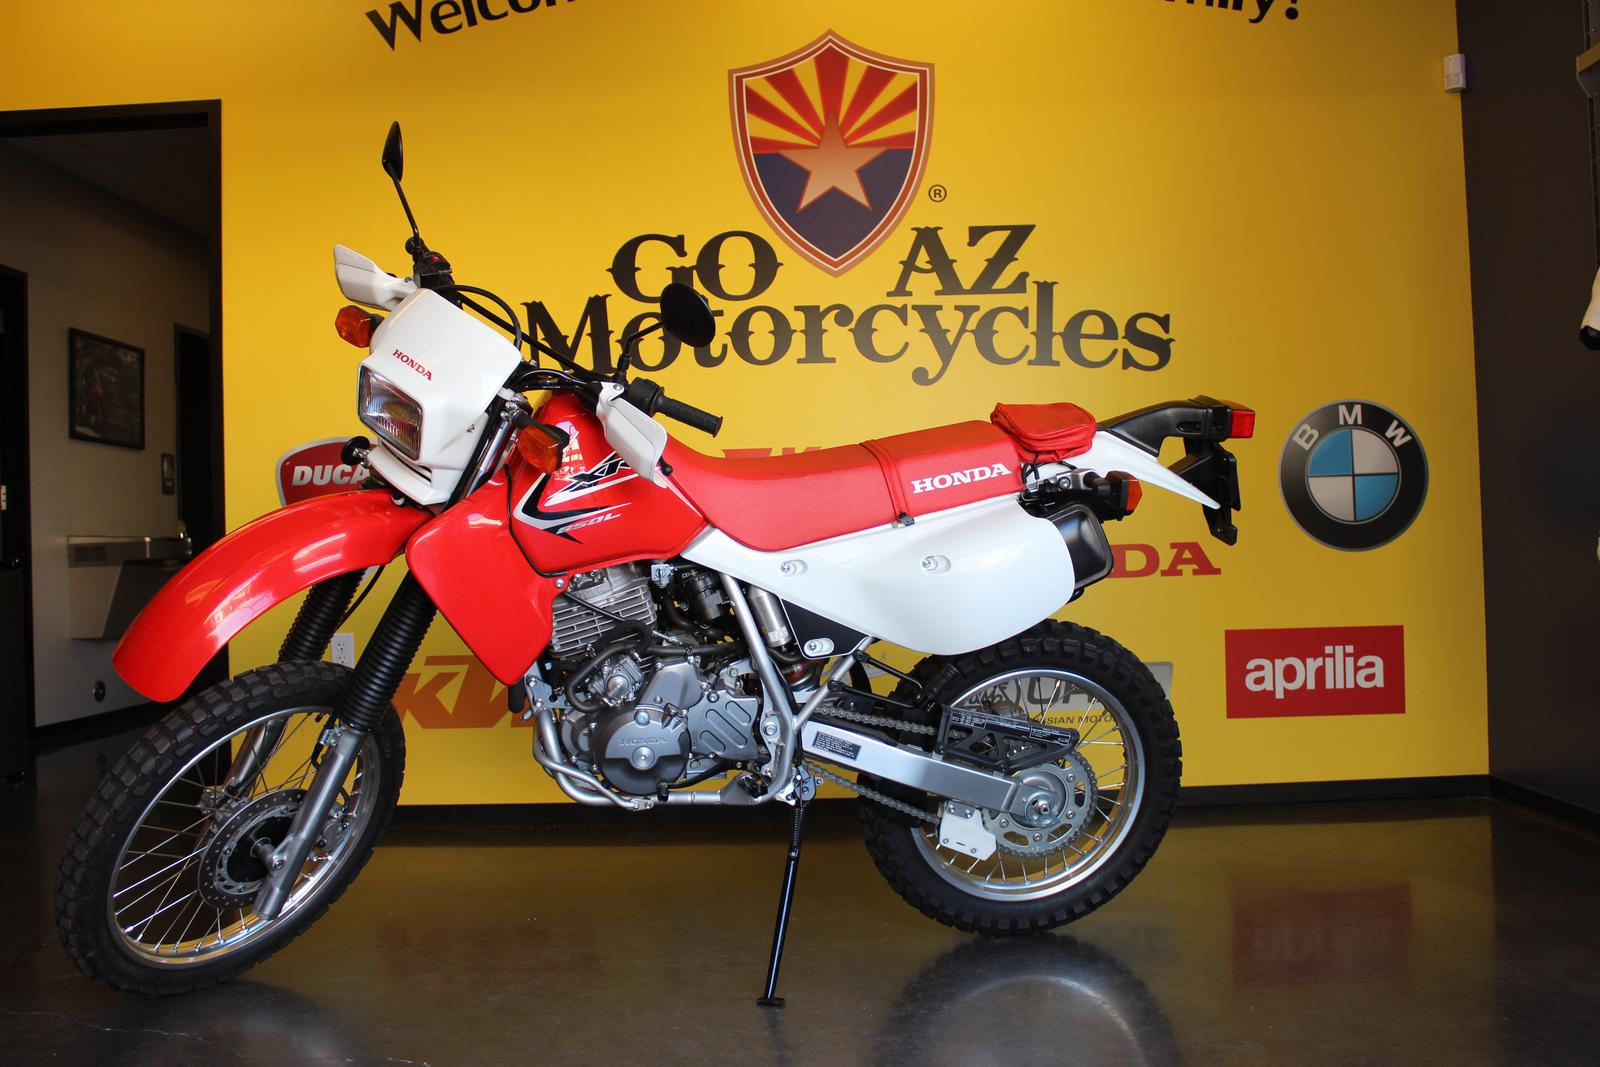 2017 honda xr650l for sale in scottsdale, az | go az motorcycles